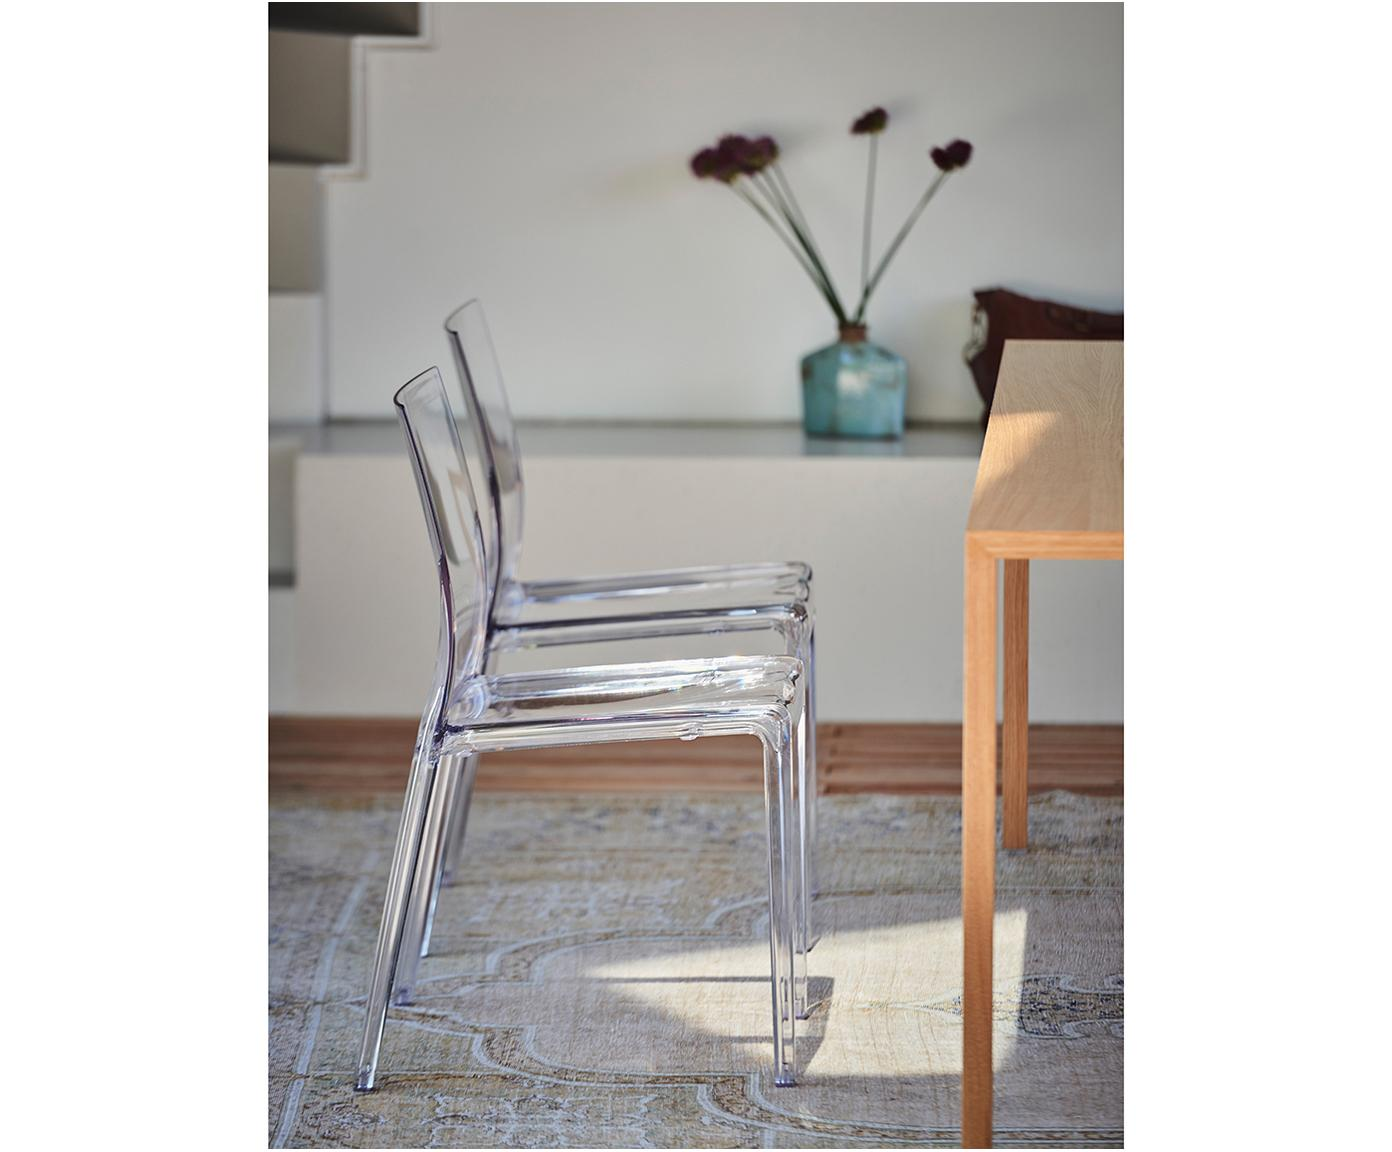 Kunststoffen stoel Mia, Kunststof (polycarbonaat), Transparant, B 46 x D 44 cm